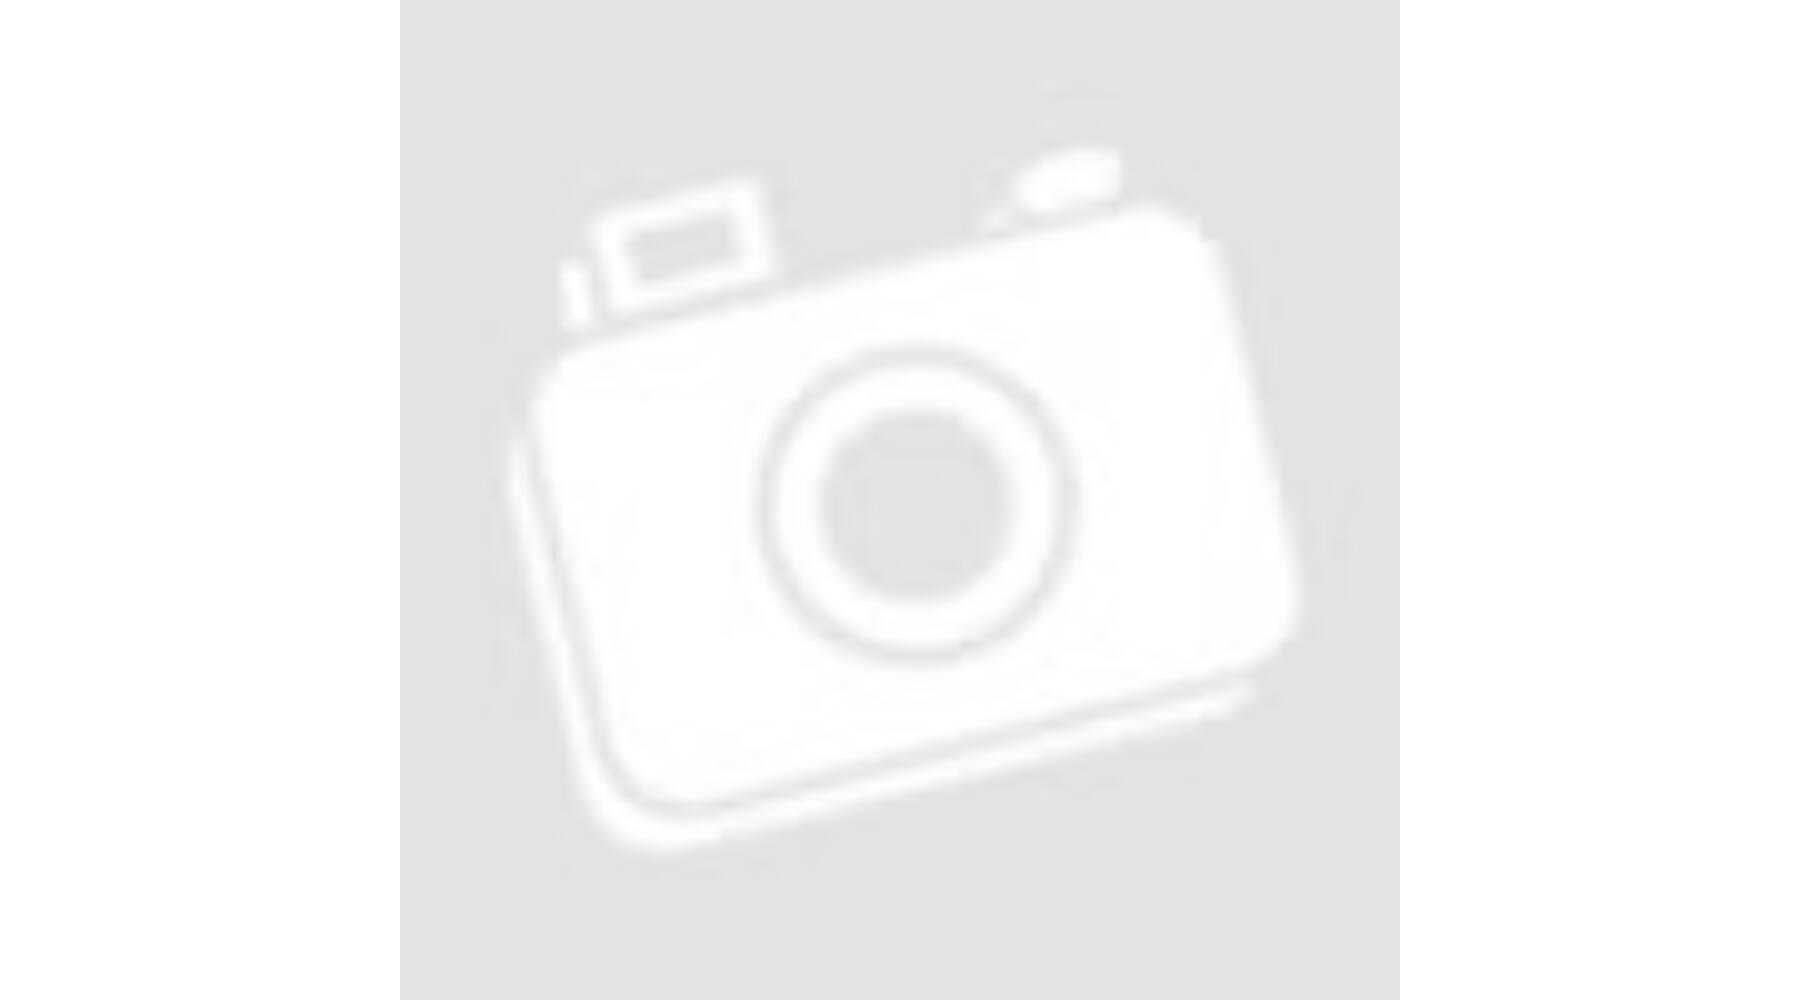 2b272b670f93 Rózsaszín-fehér Carine divattáska a Your Bag Shopban 6.990 Ft